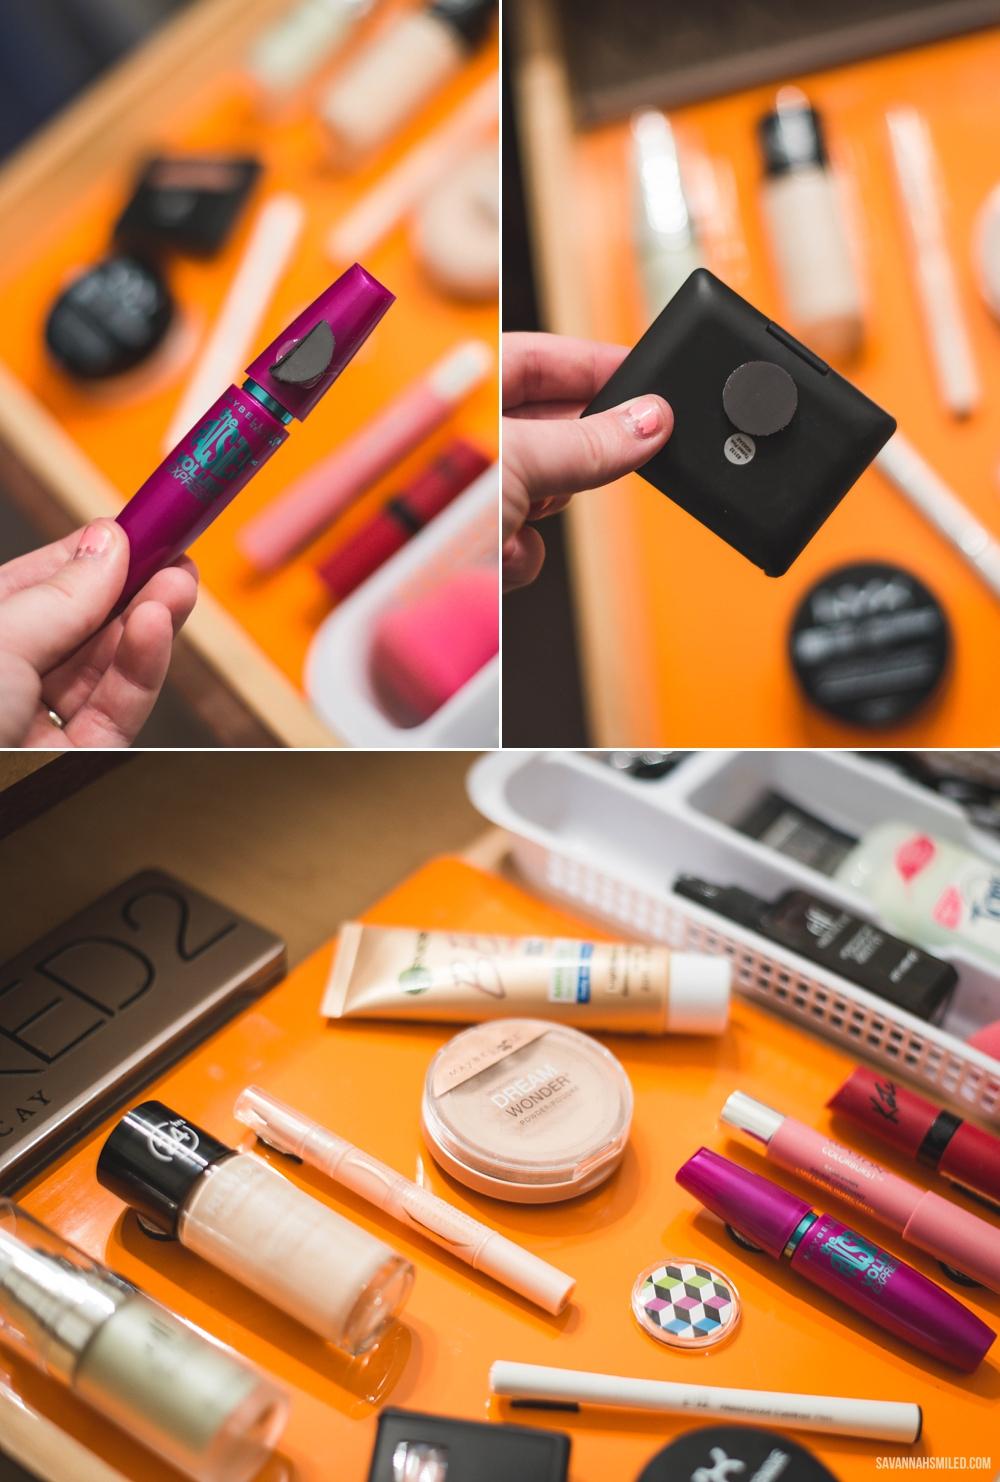 diy-makeup-magnet-organizer-11.jpg